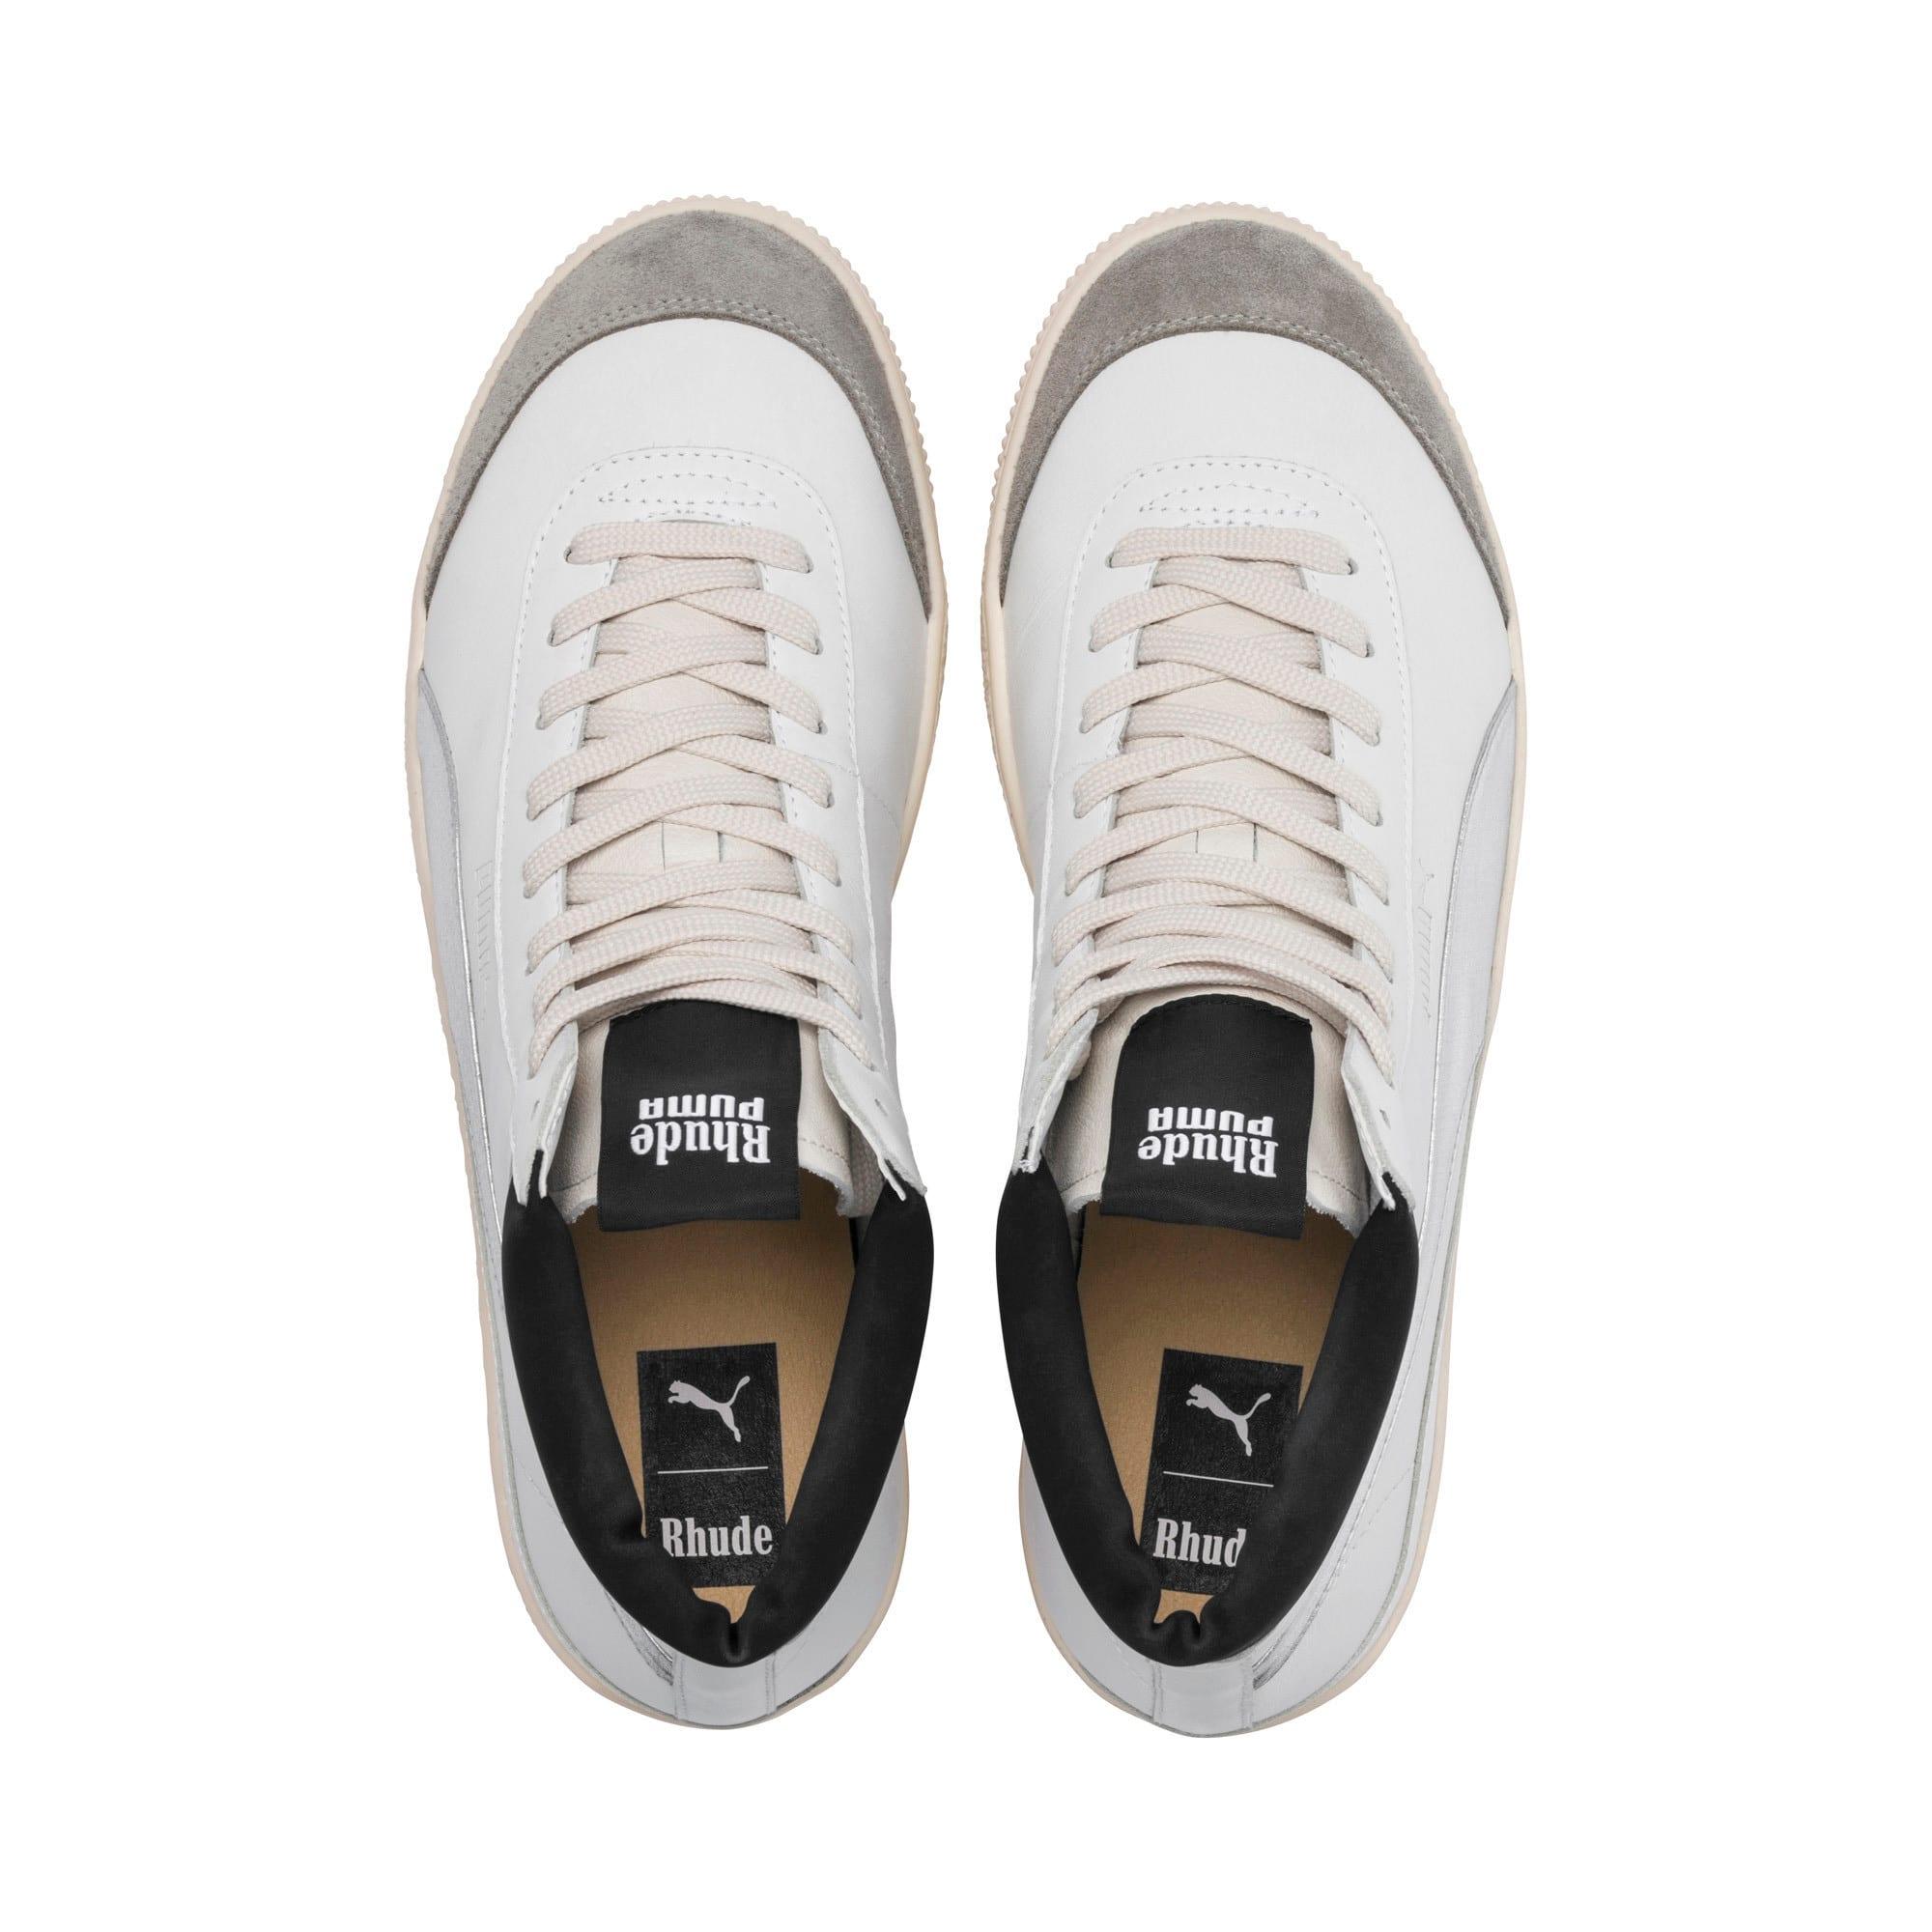 Thumbnail 6 of PUMA x RHUDE Basket '68 OG Basketball Shoes, Blanc de Blanc-Drizzle, medium